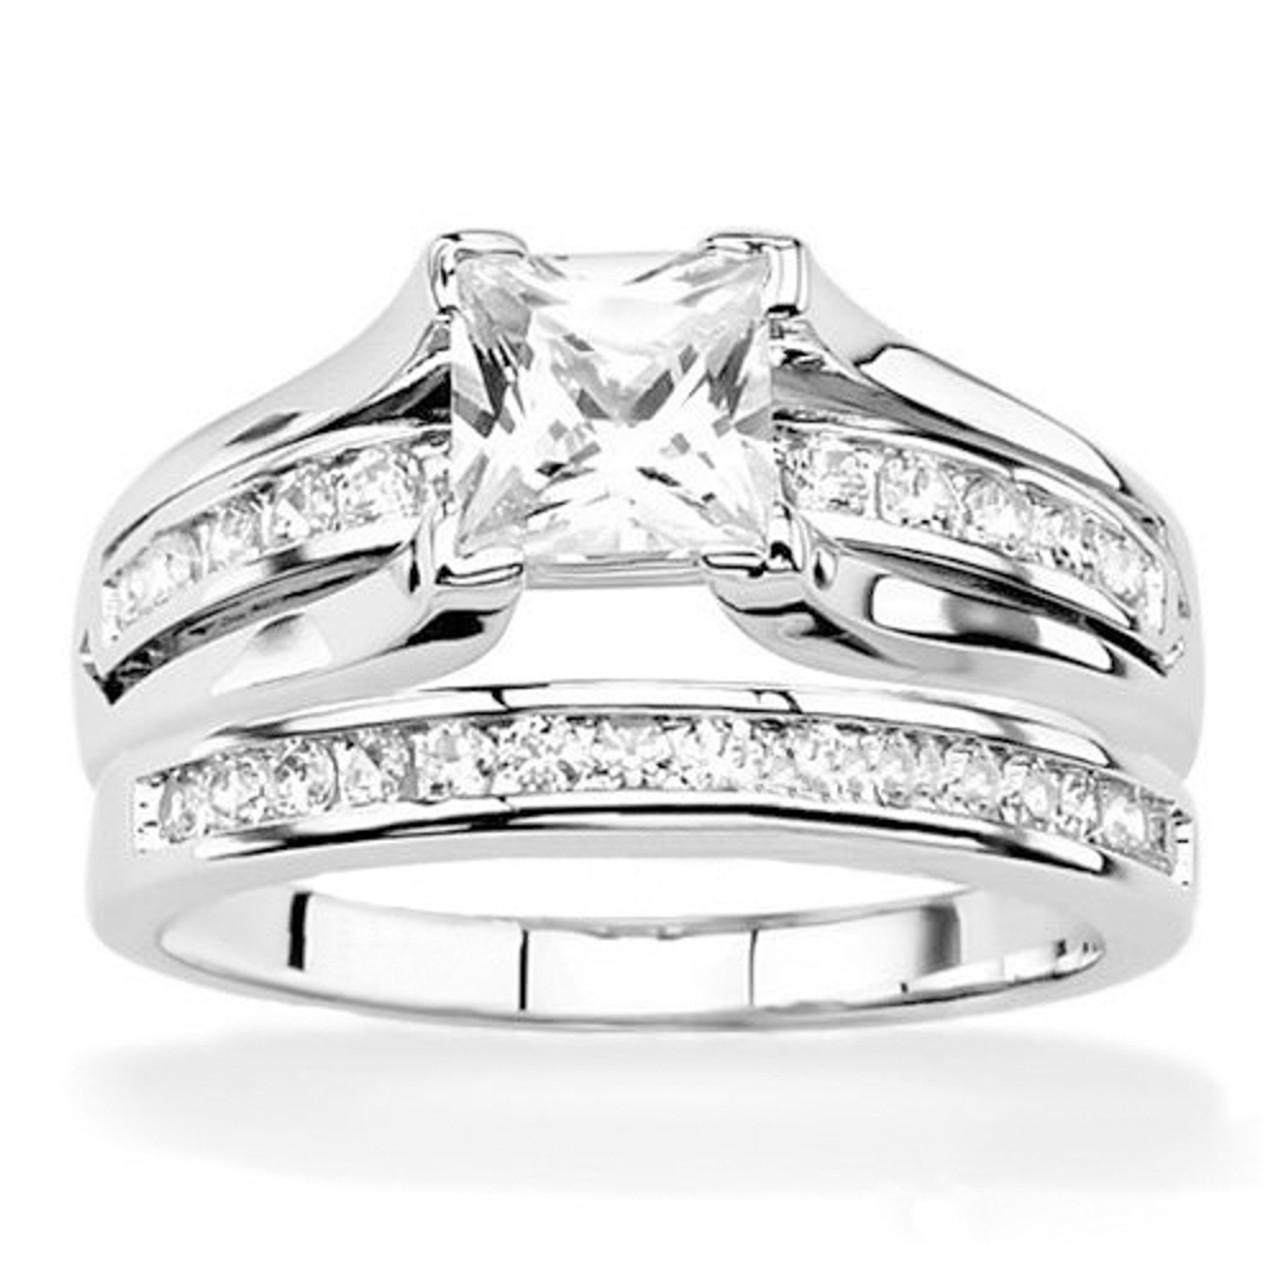 2.10 Ct Princess Cut AAA CZ 925 Sterling Silver Wedding Ring Set Women/'s Sz 5-11